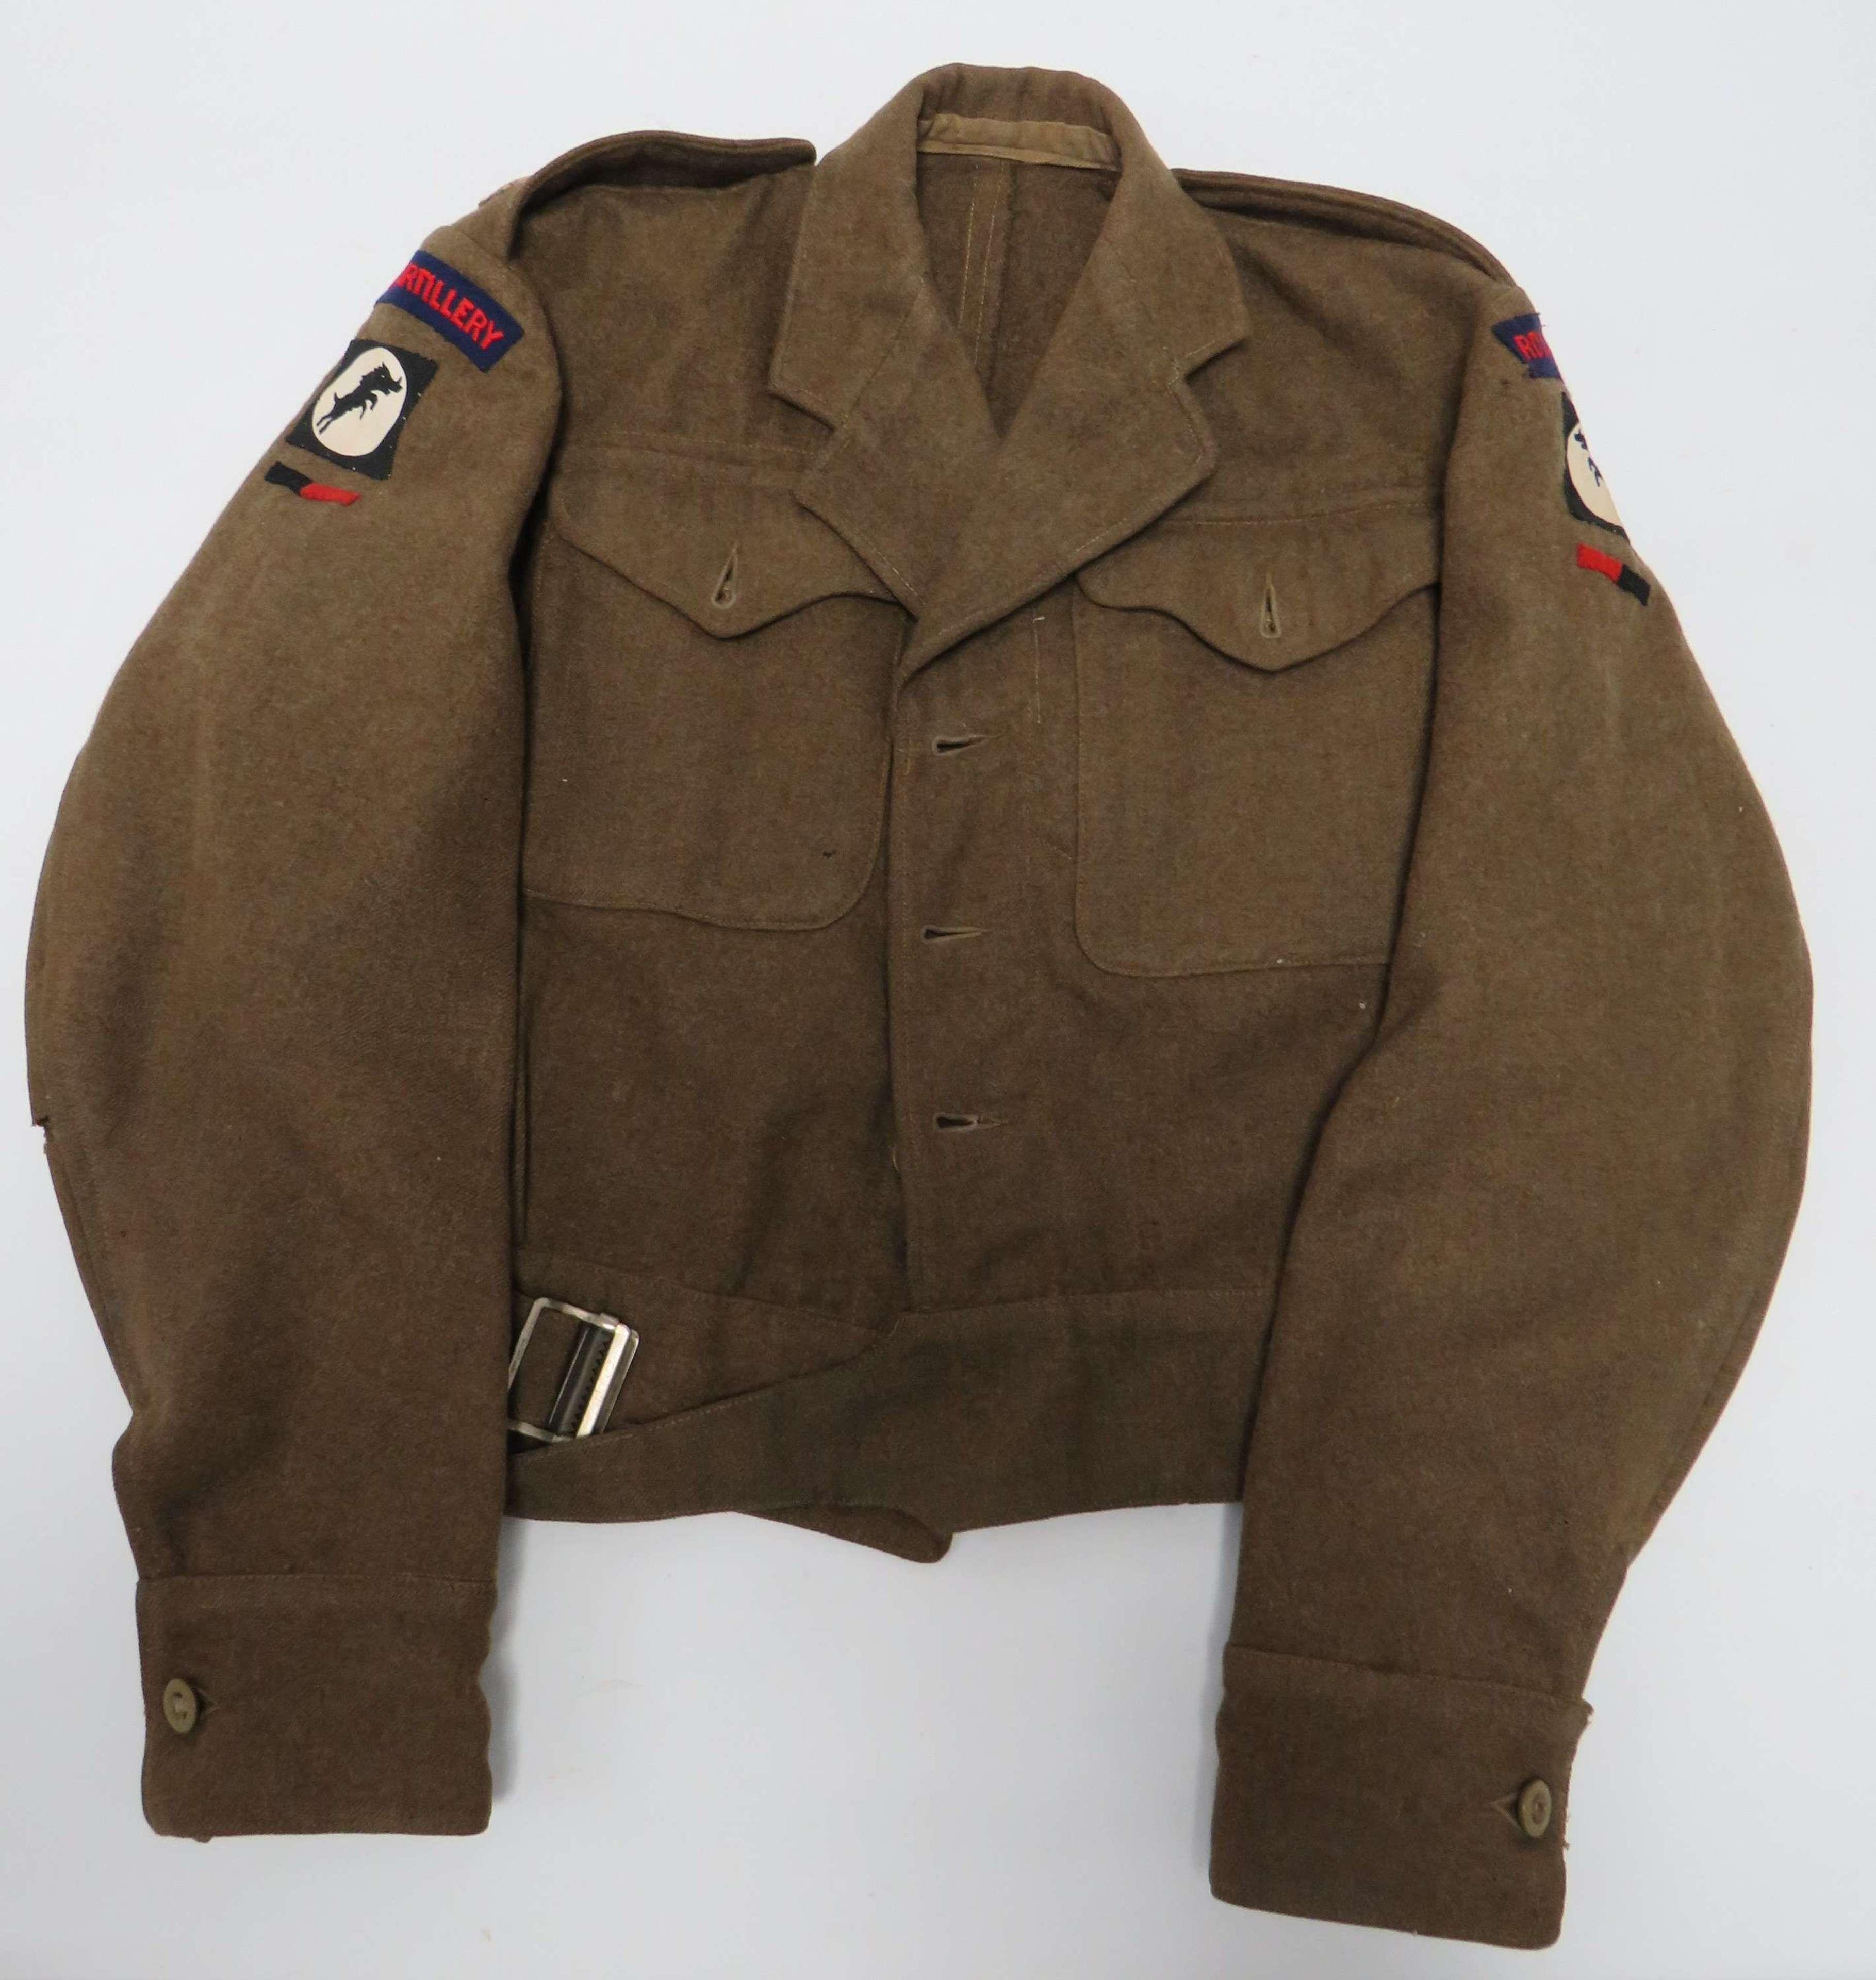 30 Corps Royal Artillery Officers 1940 Pattern Battledress Jacket